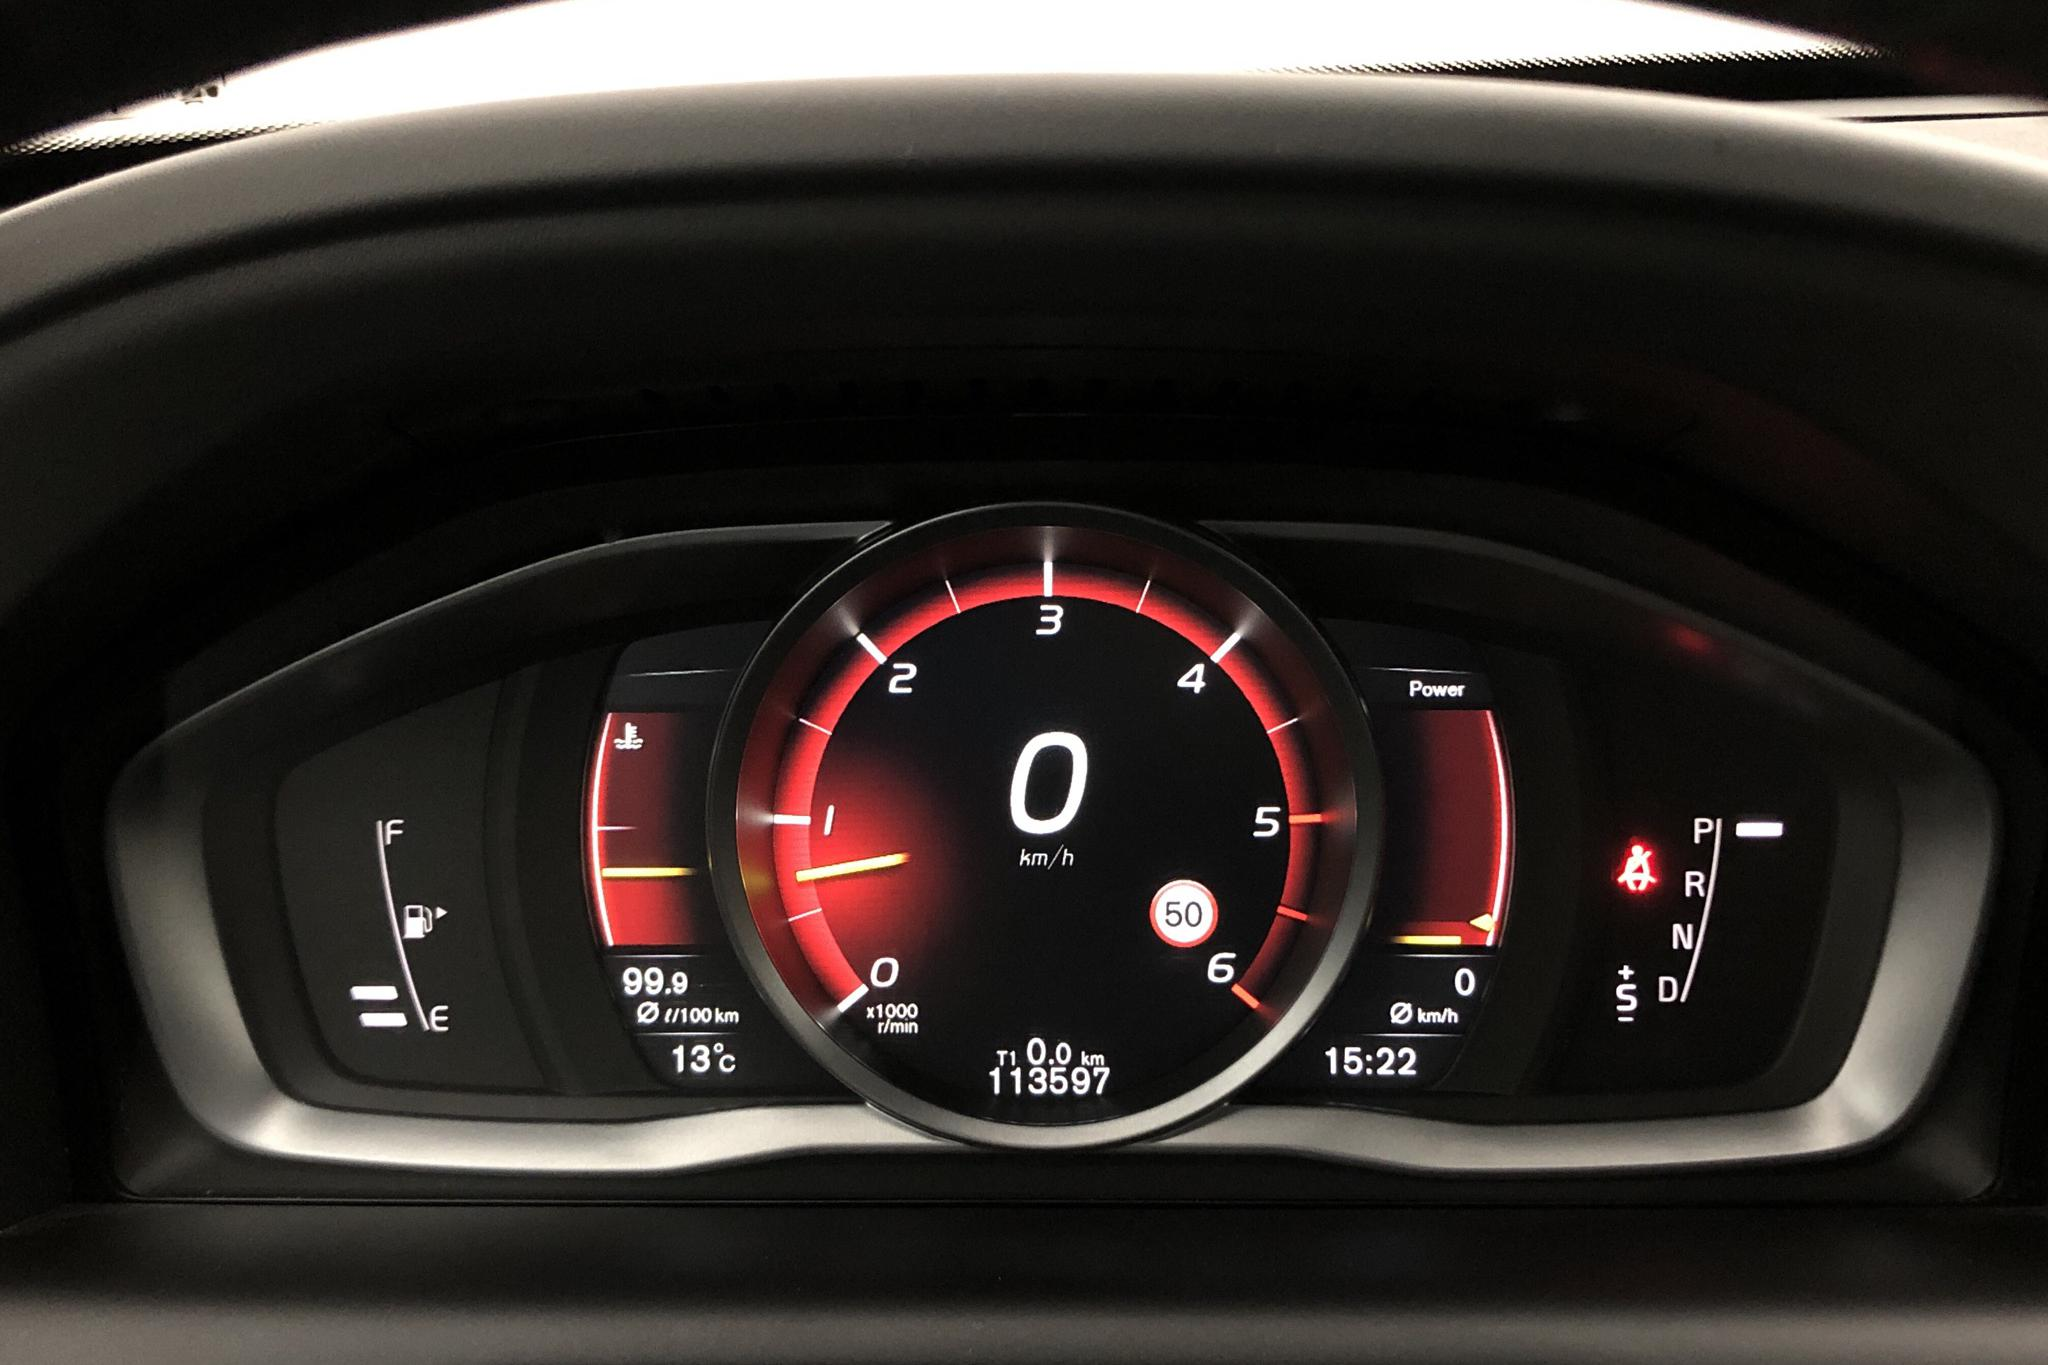 Volvo XC60 D4 AWD (190hk) - 113 590 km - Automatic - silver - 2017